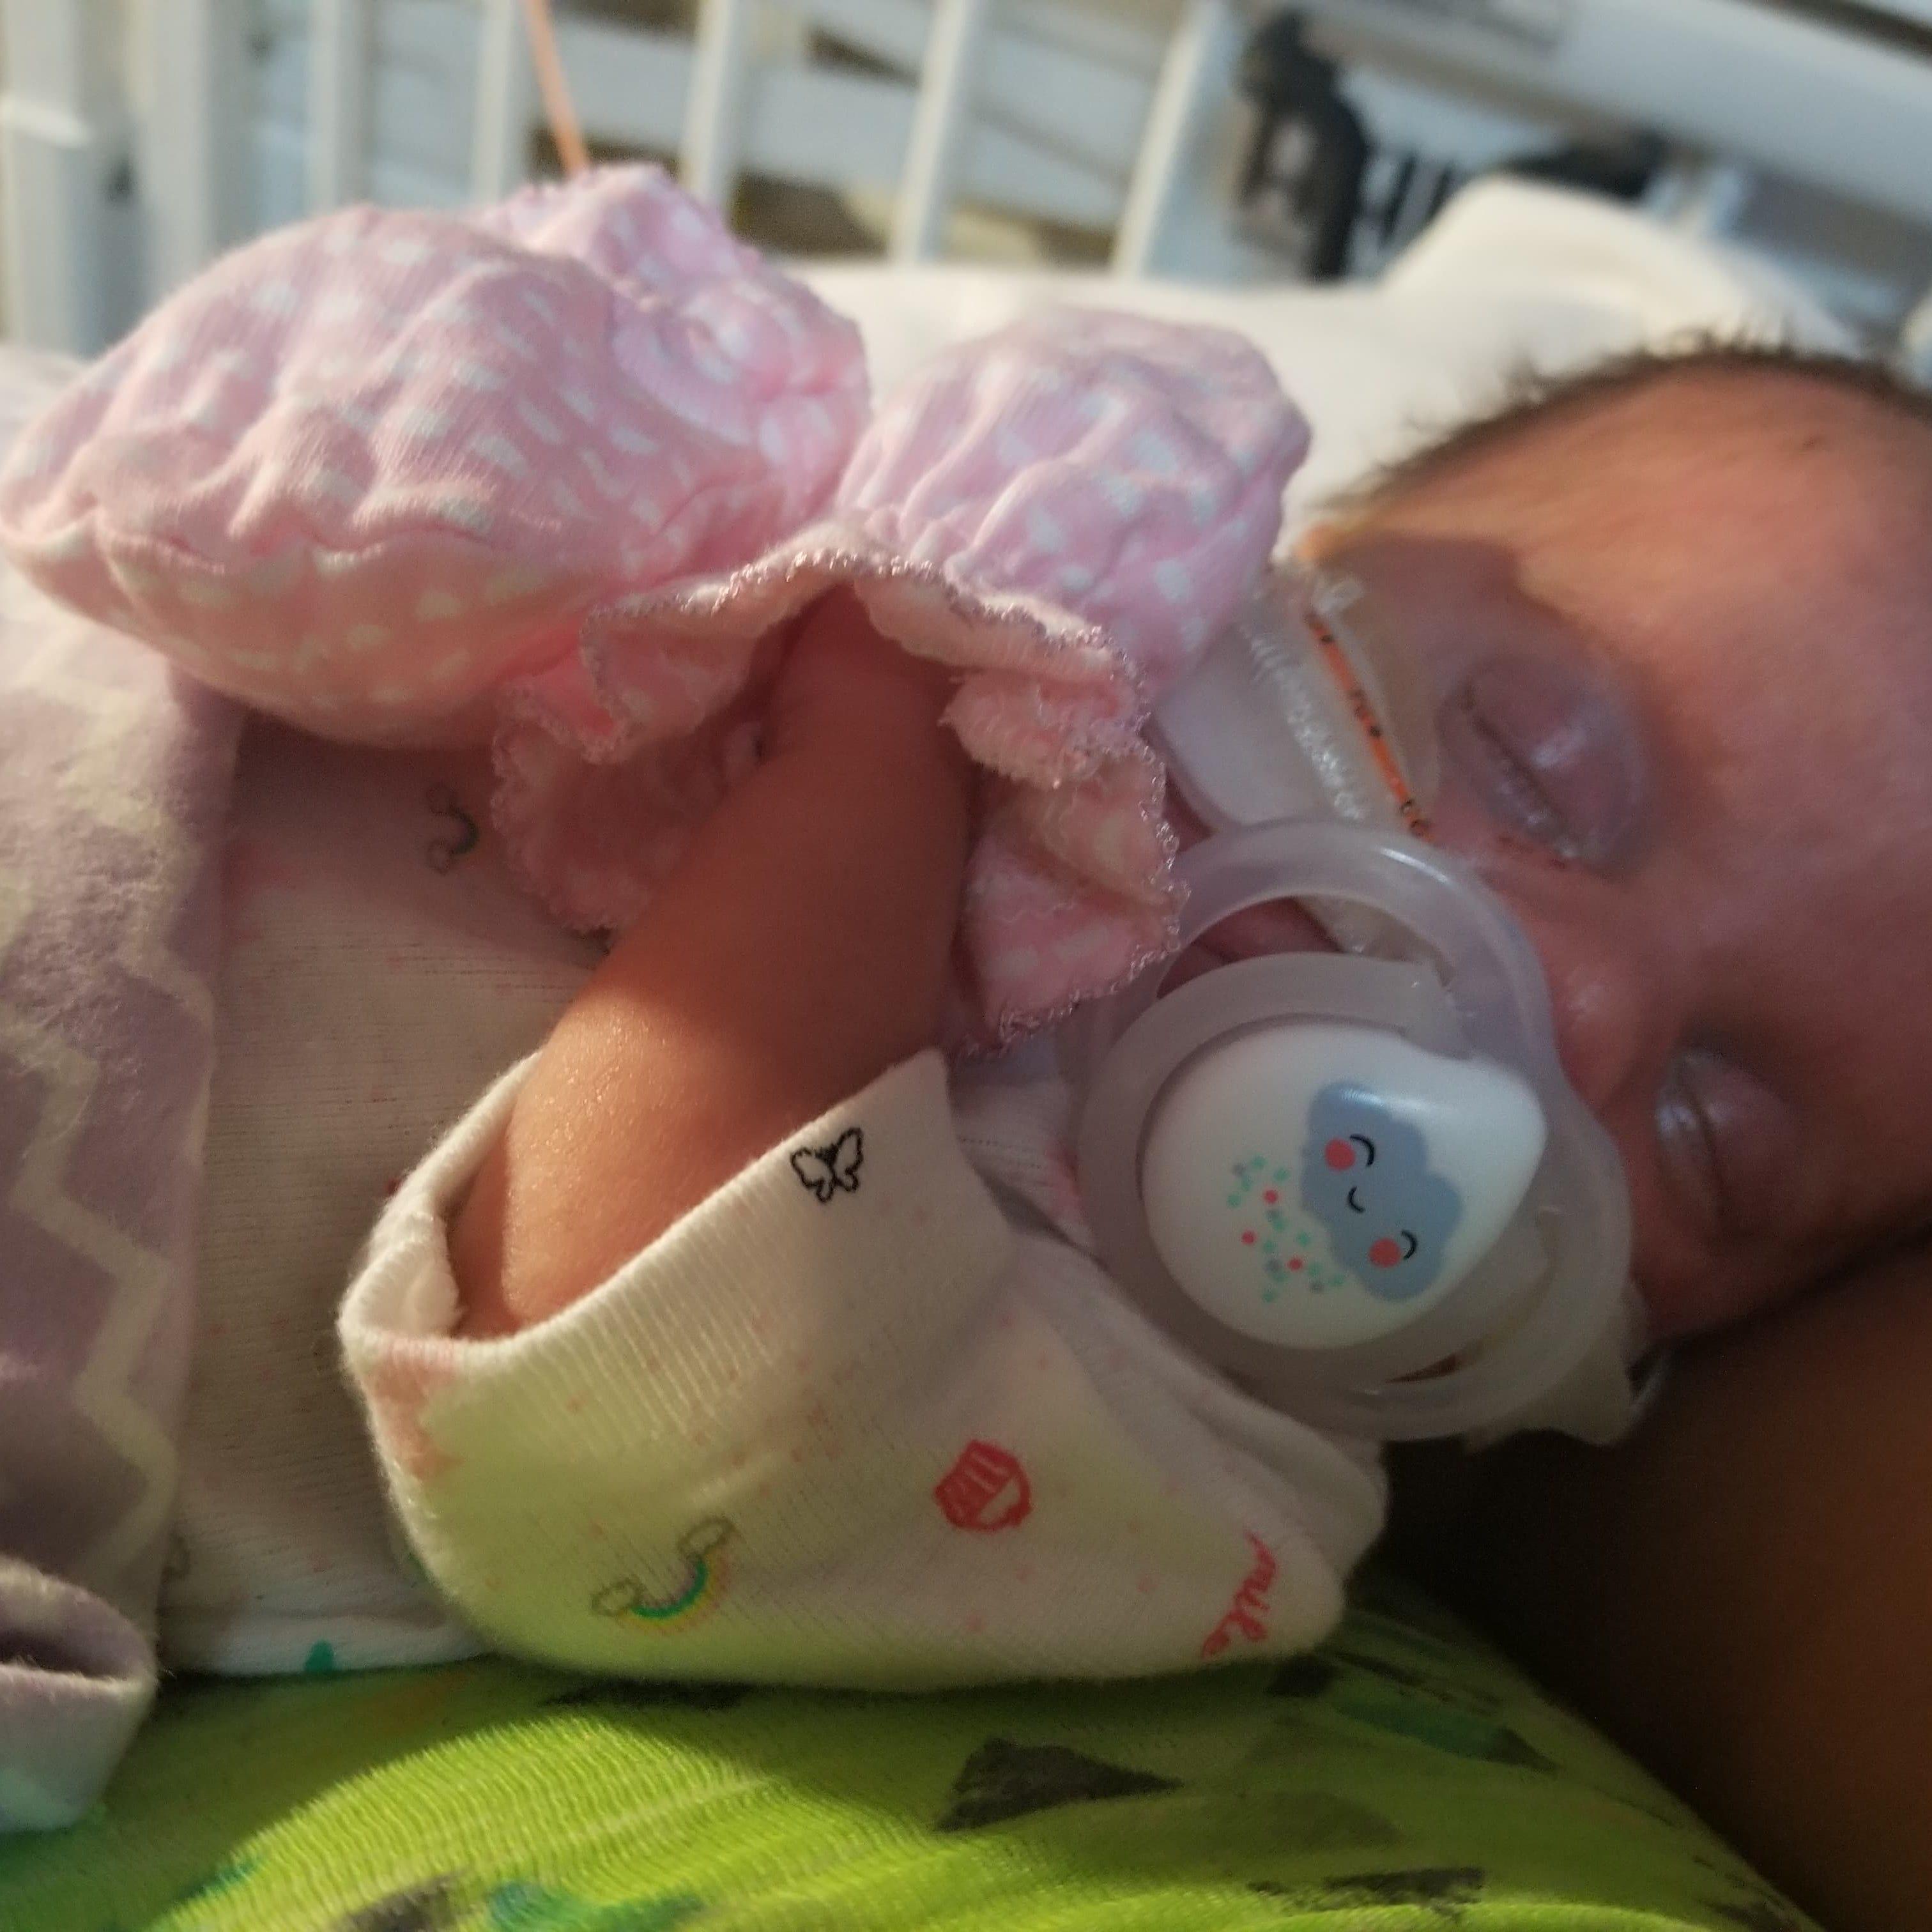 Staunton newborn has rare genetic disease GACI